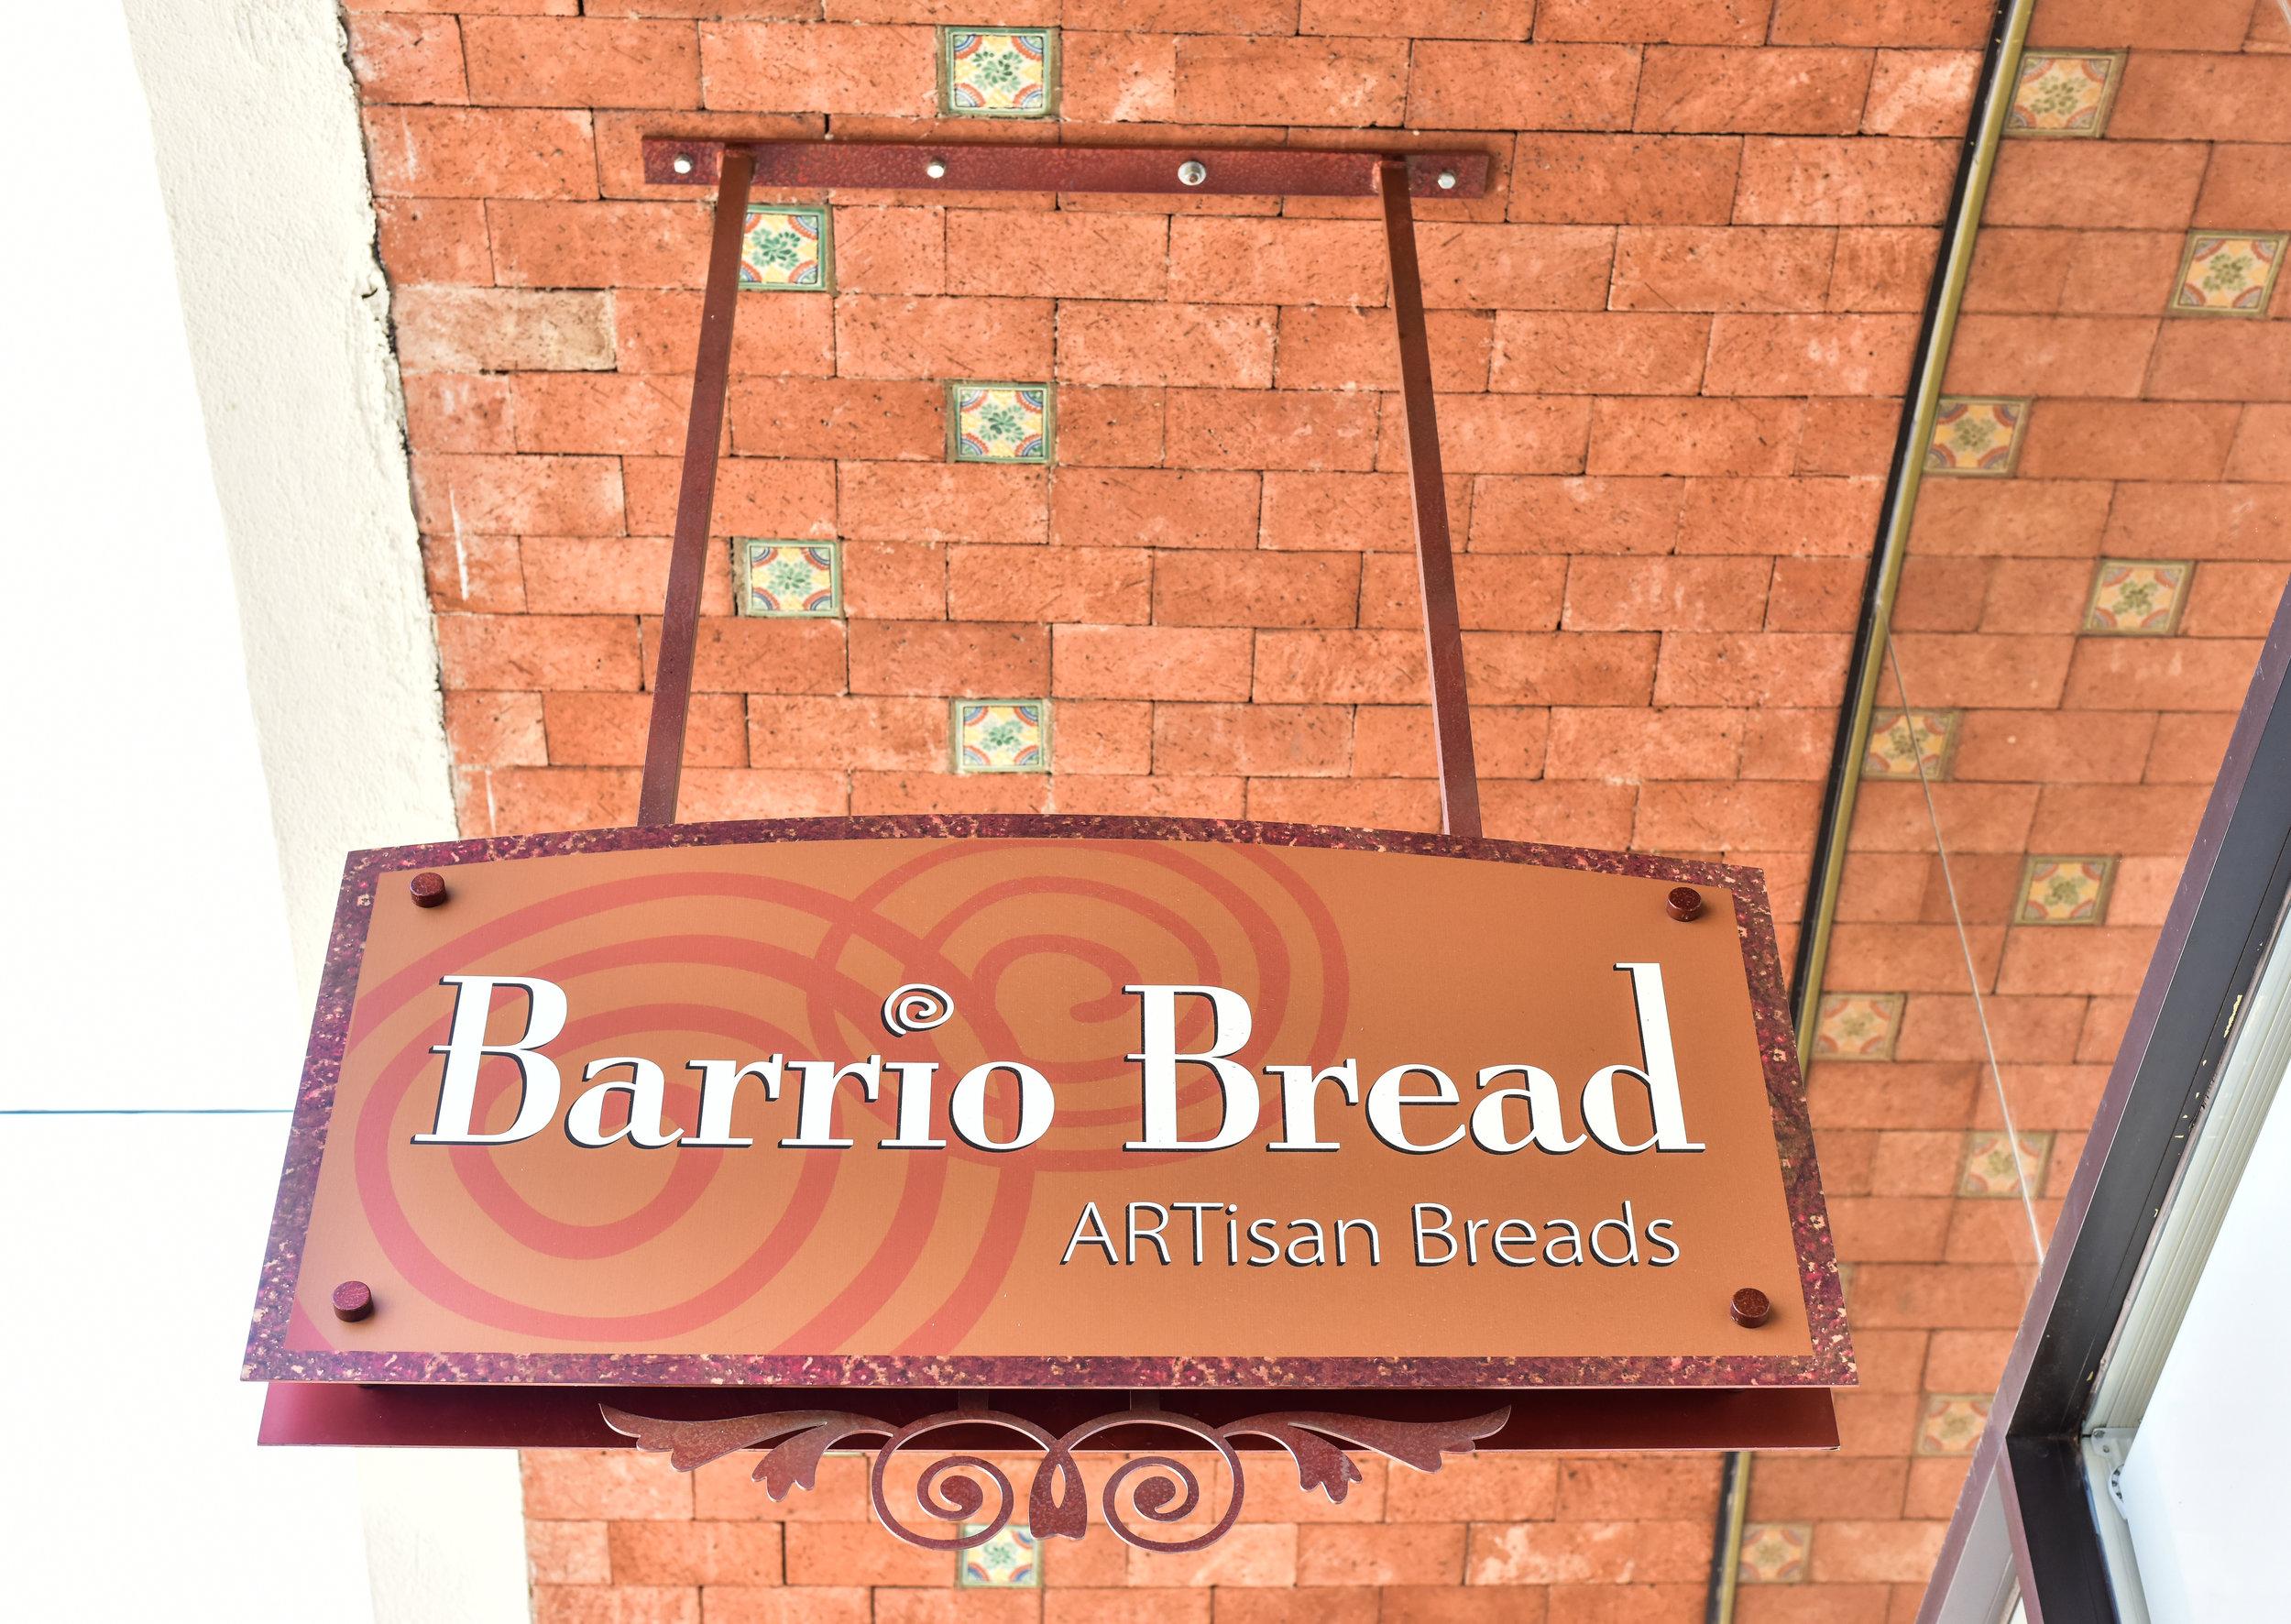 Barrio Bread Bakery sign